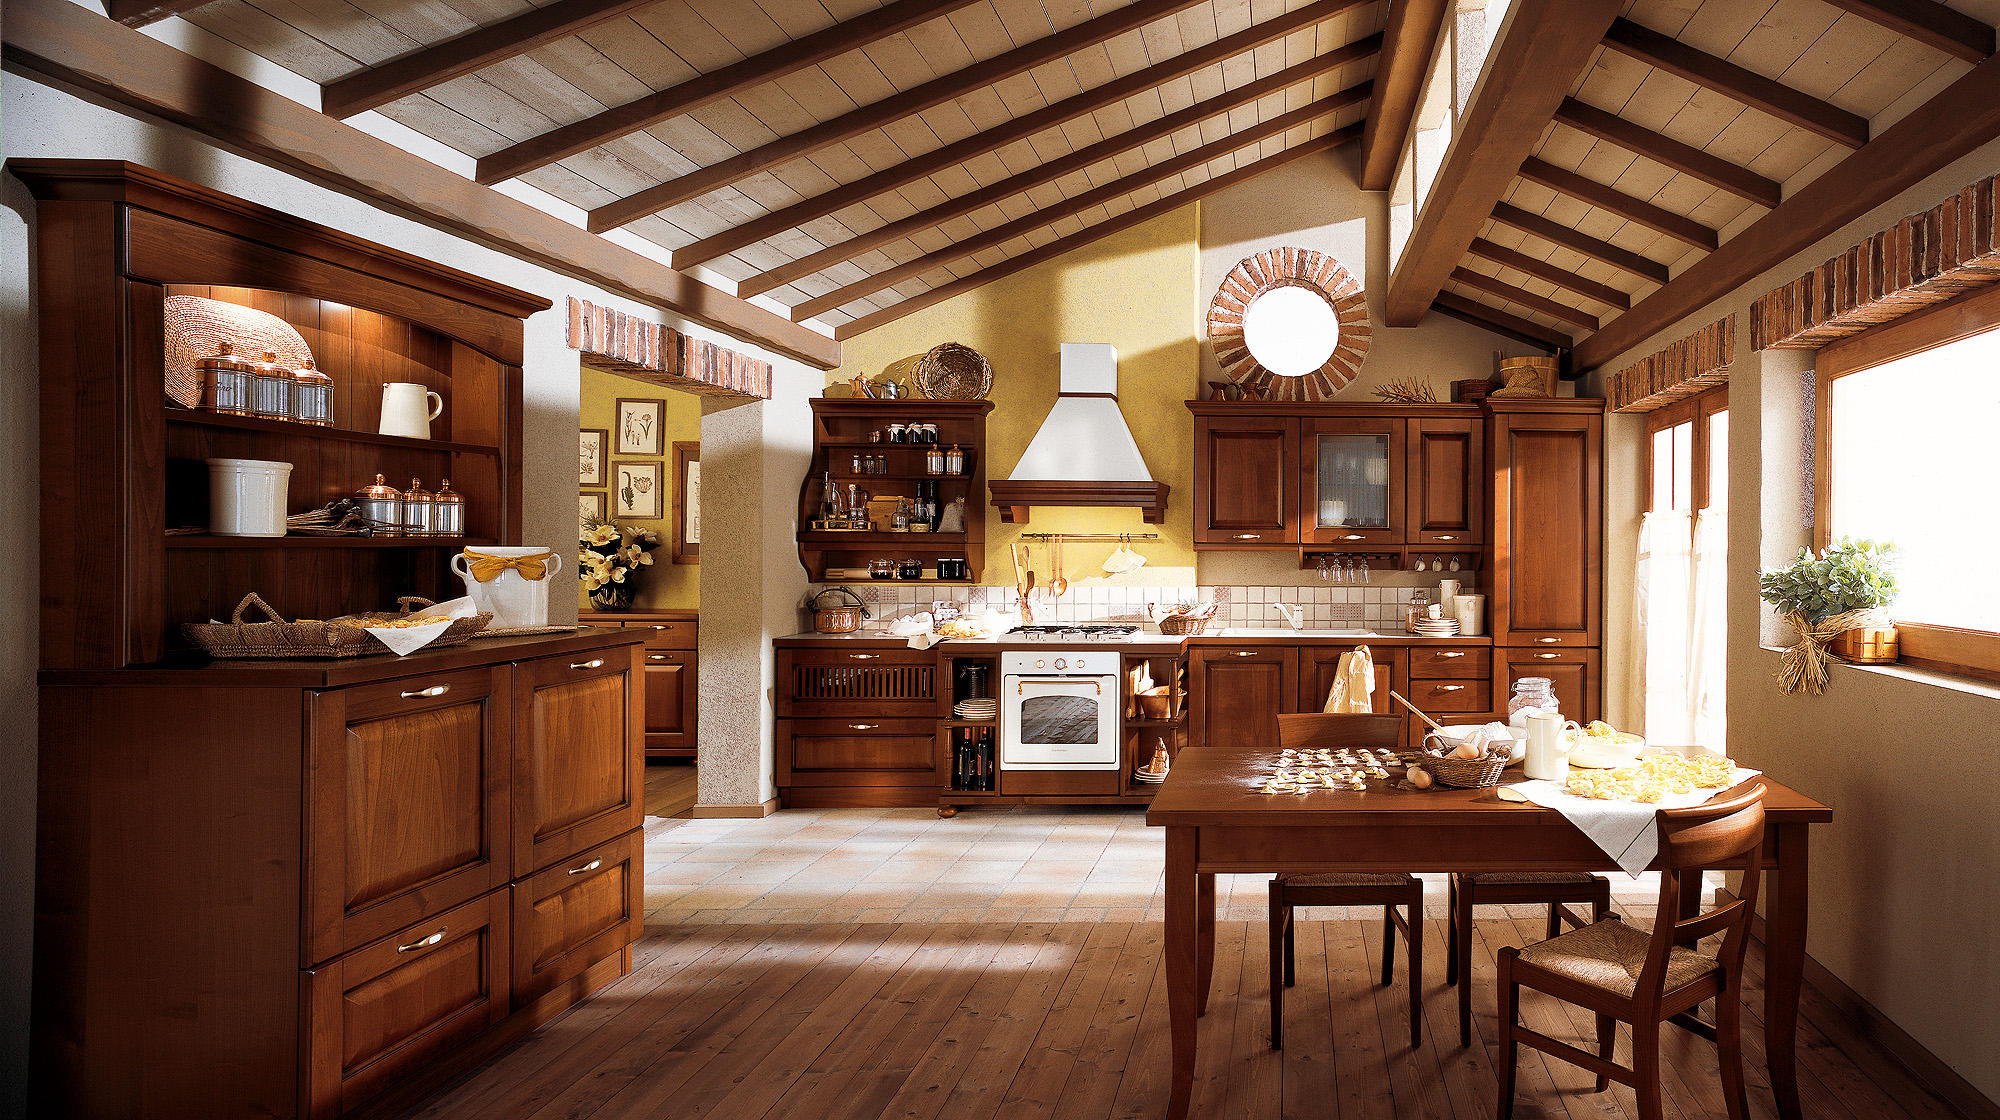 VERDIANA - Cucine a parete Veneta Cucine | Architonic